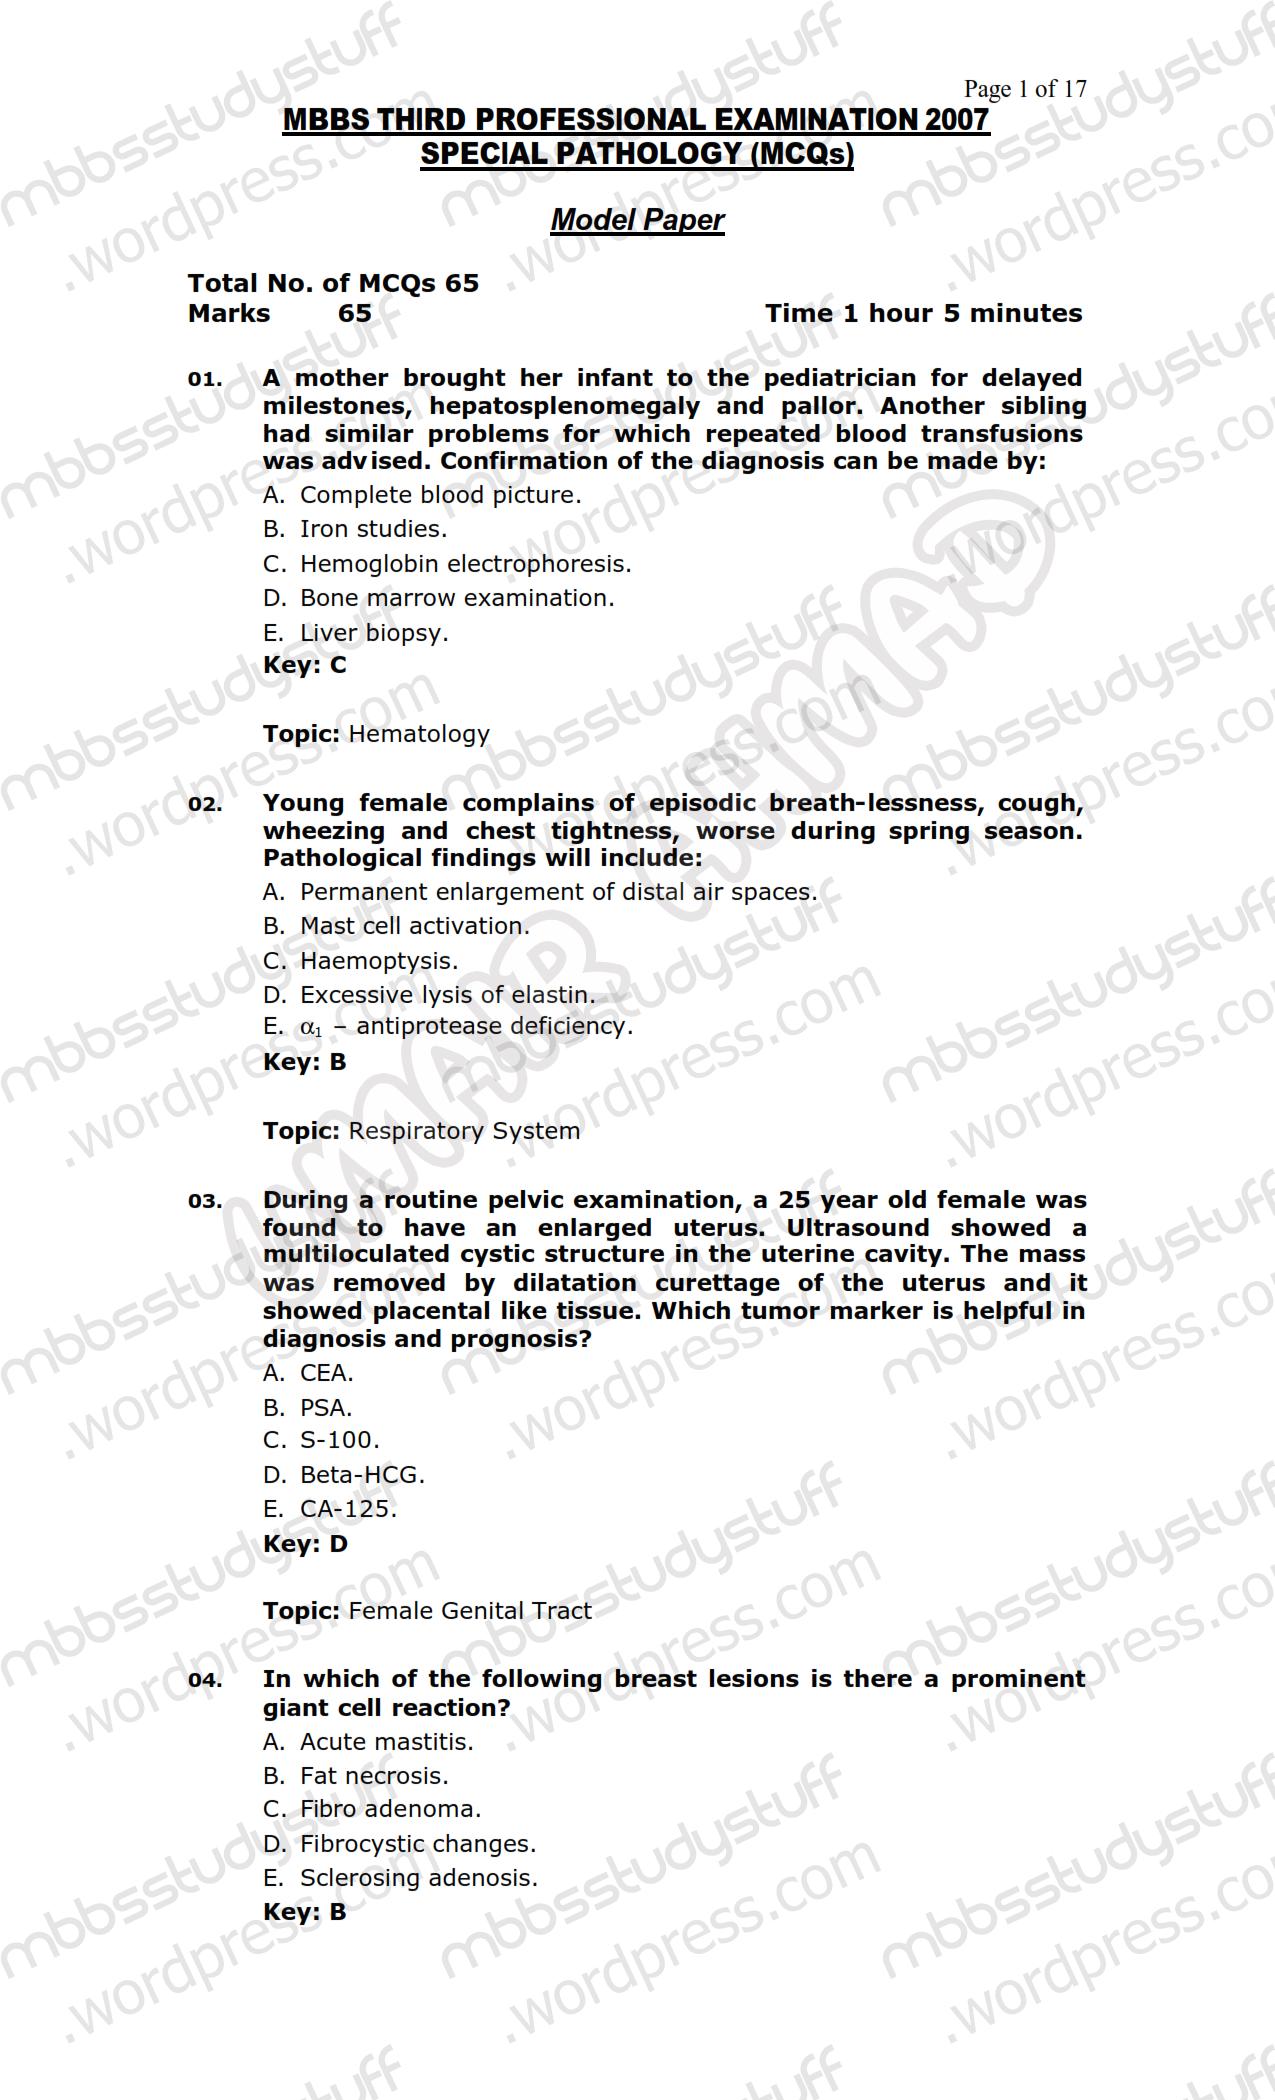 SPECIAL PATHOLOGY MCQ MODEL PAPER 2007 | MBBS Study Stuff